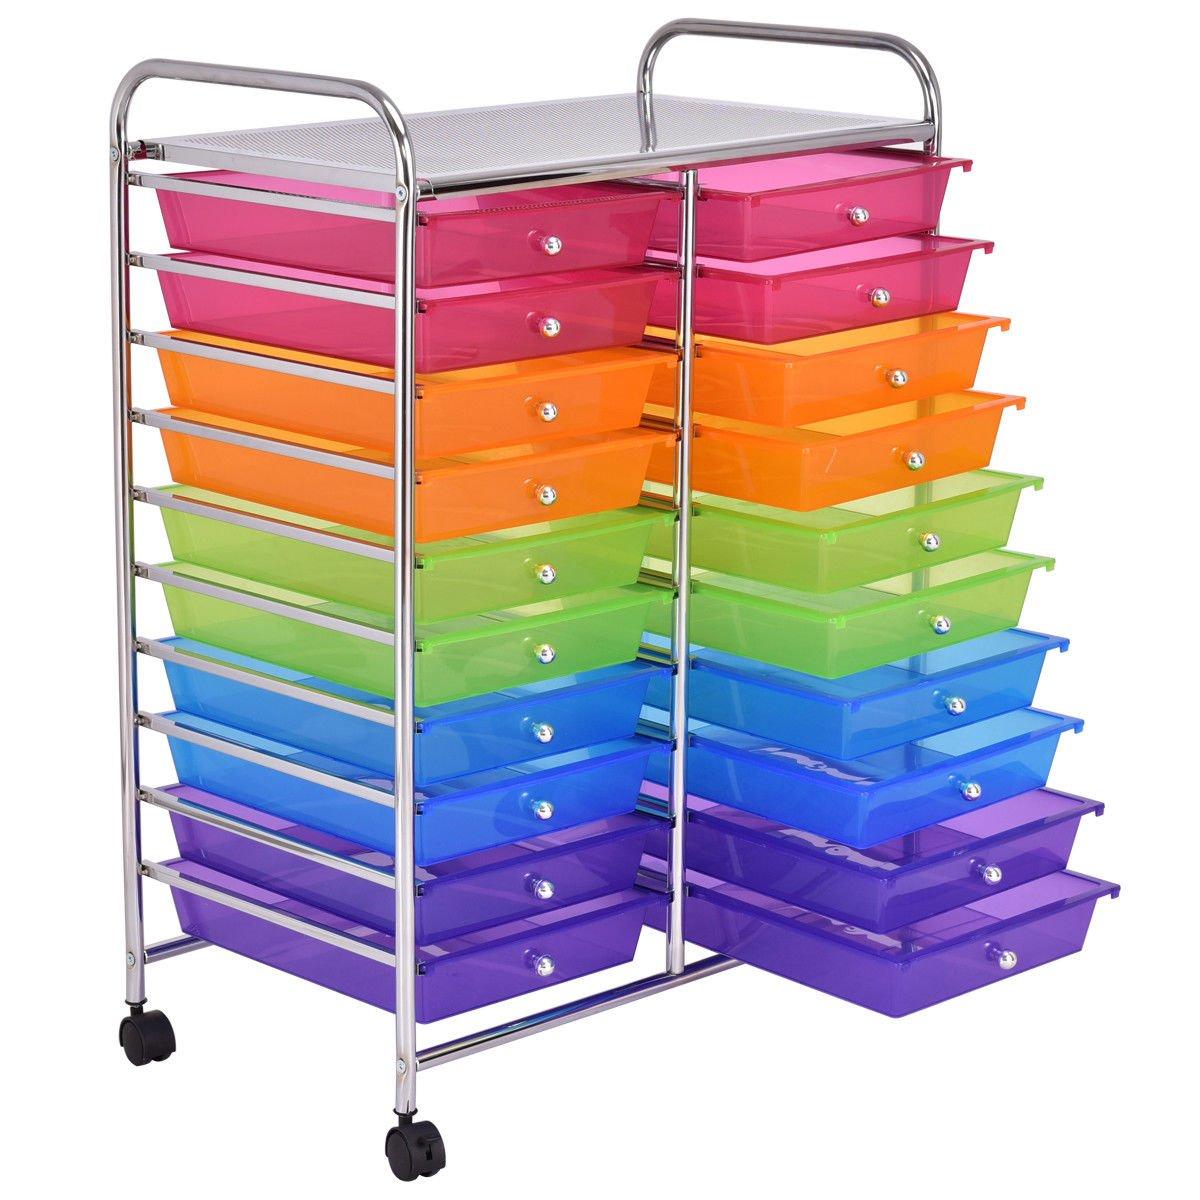 20 Drawers Rolling Cart Storage Scrapbook Paper Studio Organizer Mutli Color